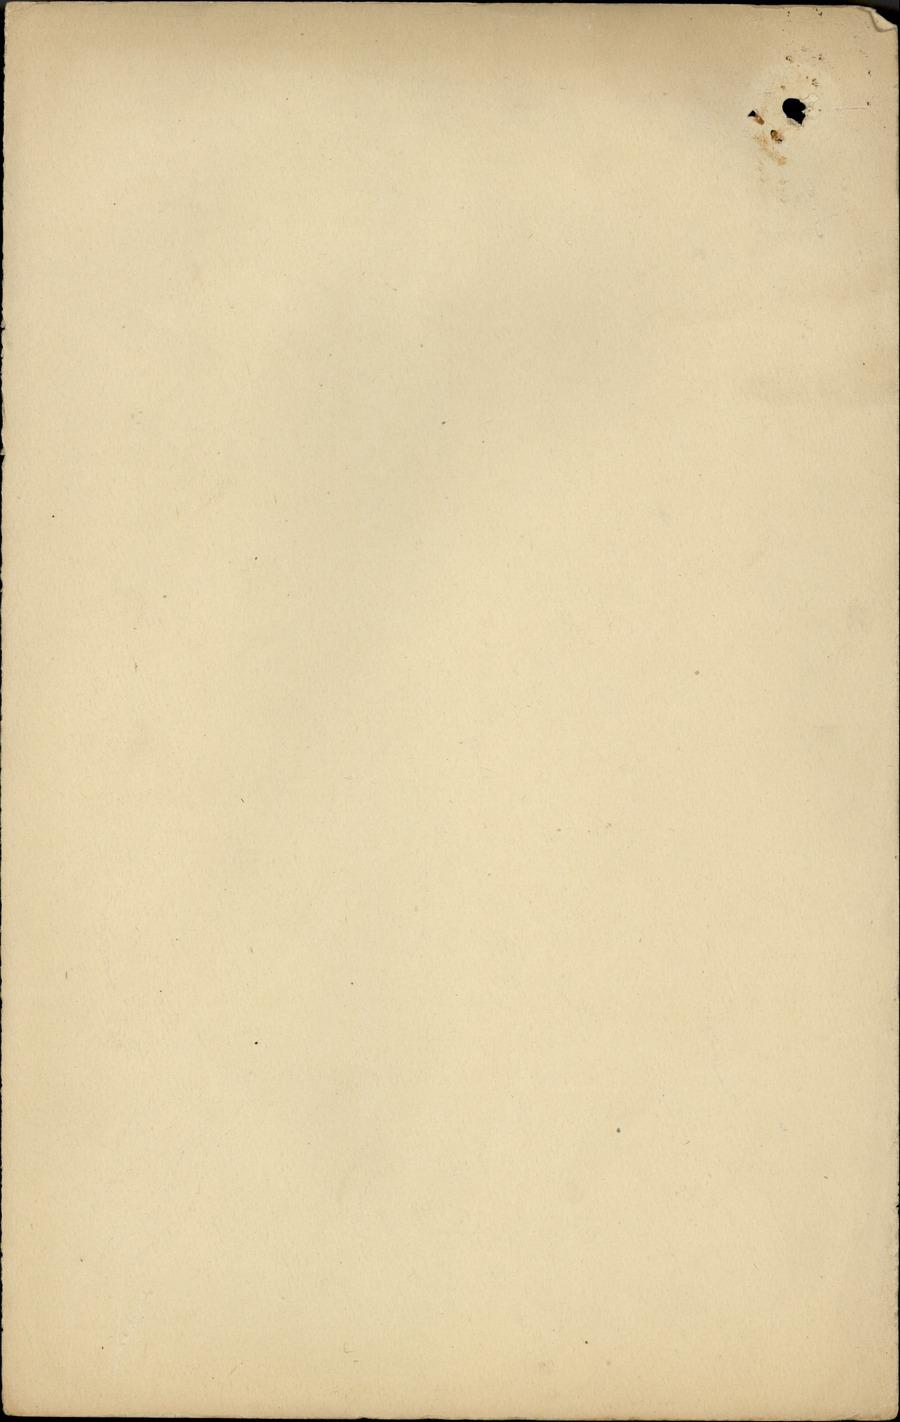 PEACOCK, James - WW1 24/1166 - Army [Original Paper Personnel File]